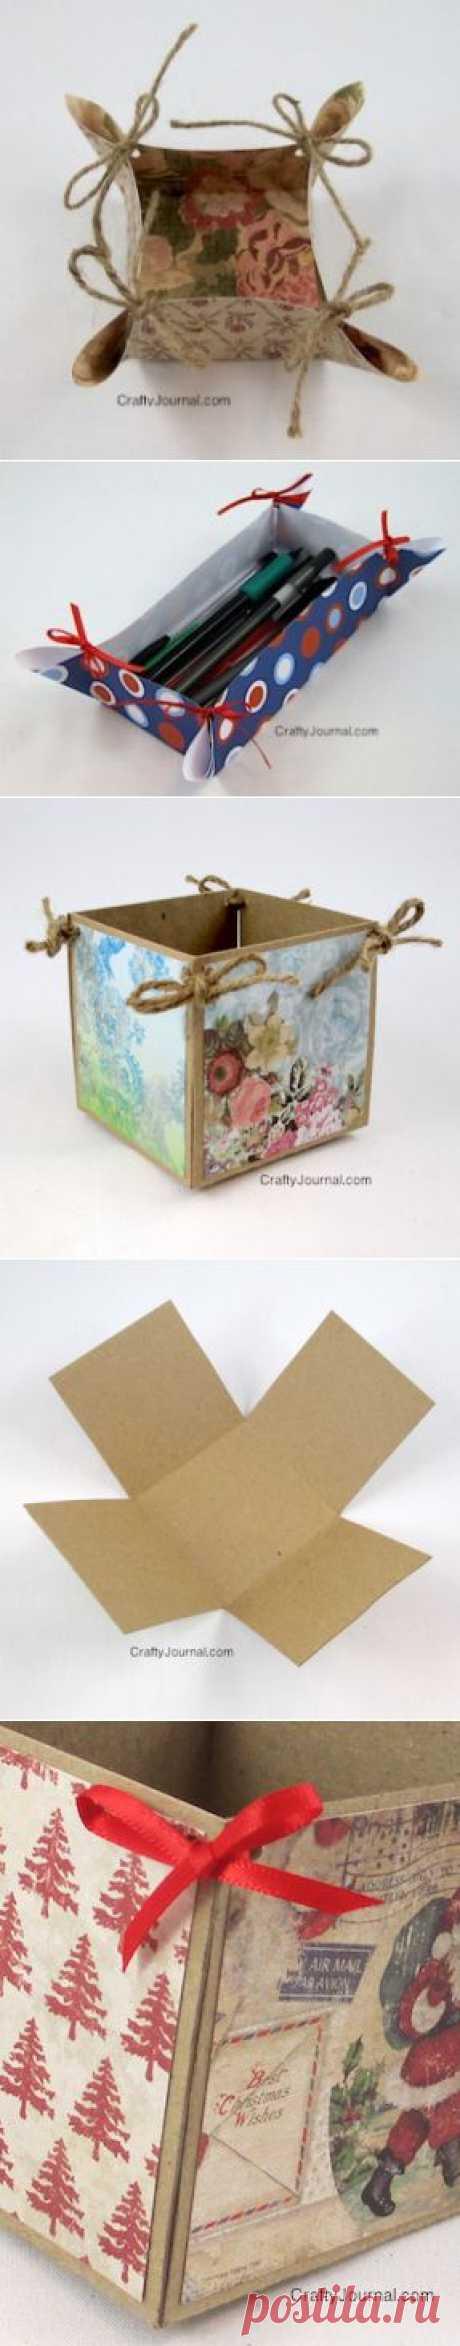 Бумажные корзинки и коробочки.